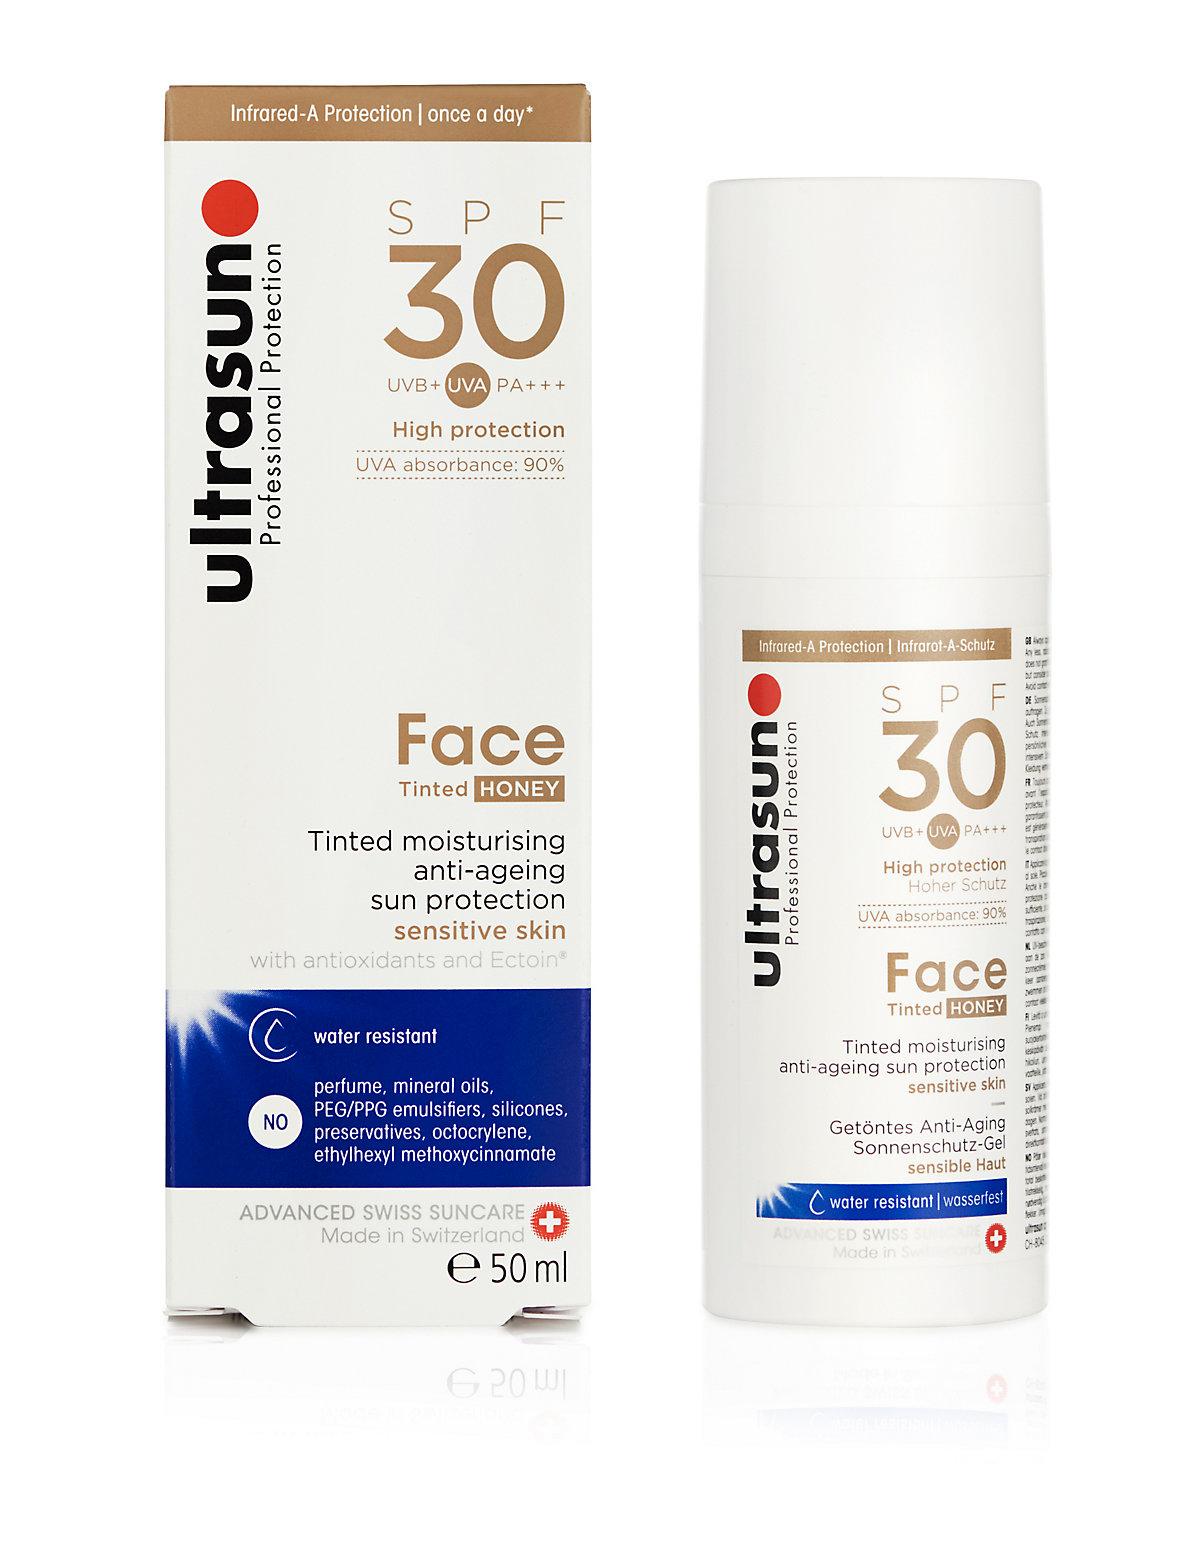 Ultrasun Face Tinted SPF 30 Honey 50ml